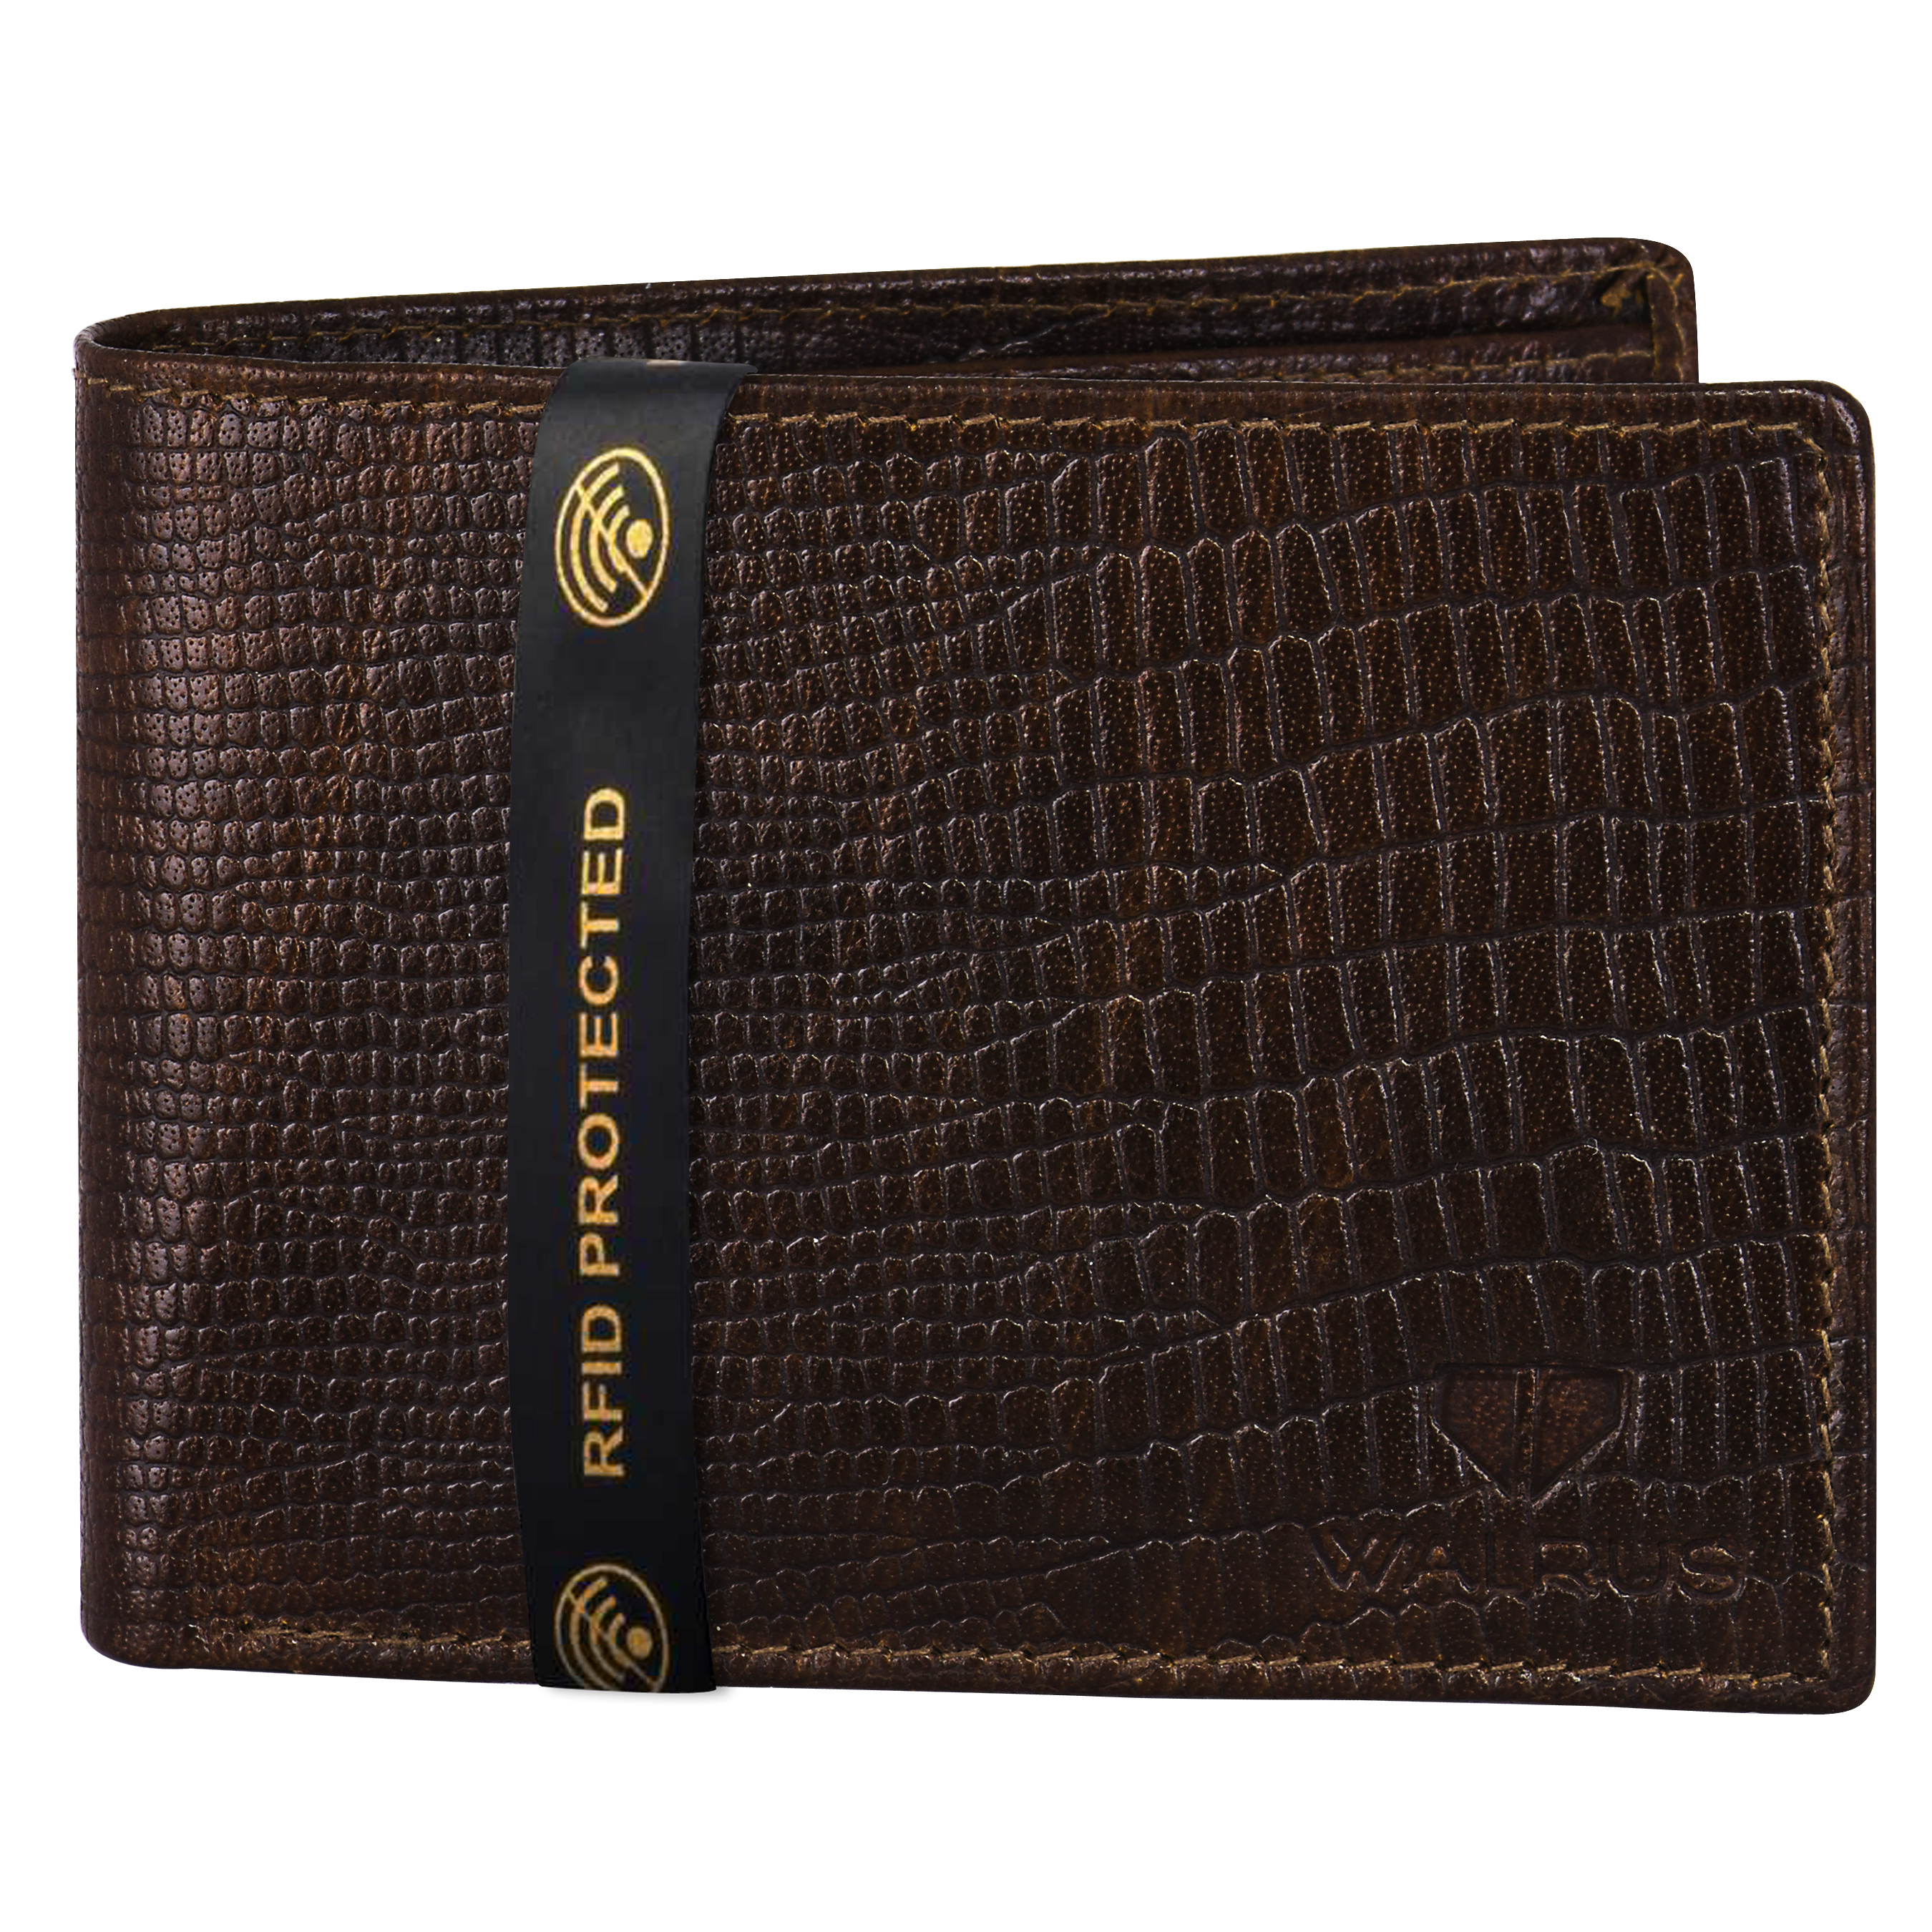 Walrus | Walrus Elite IX Brown Premium Genuine Leather Men Wallet With RFID Protection.